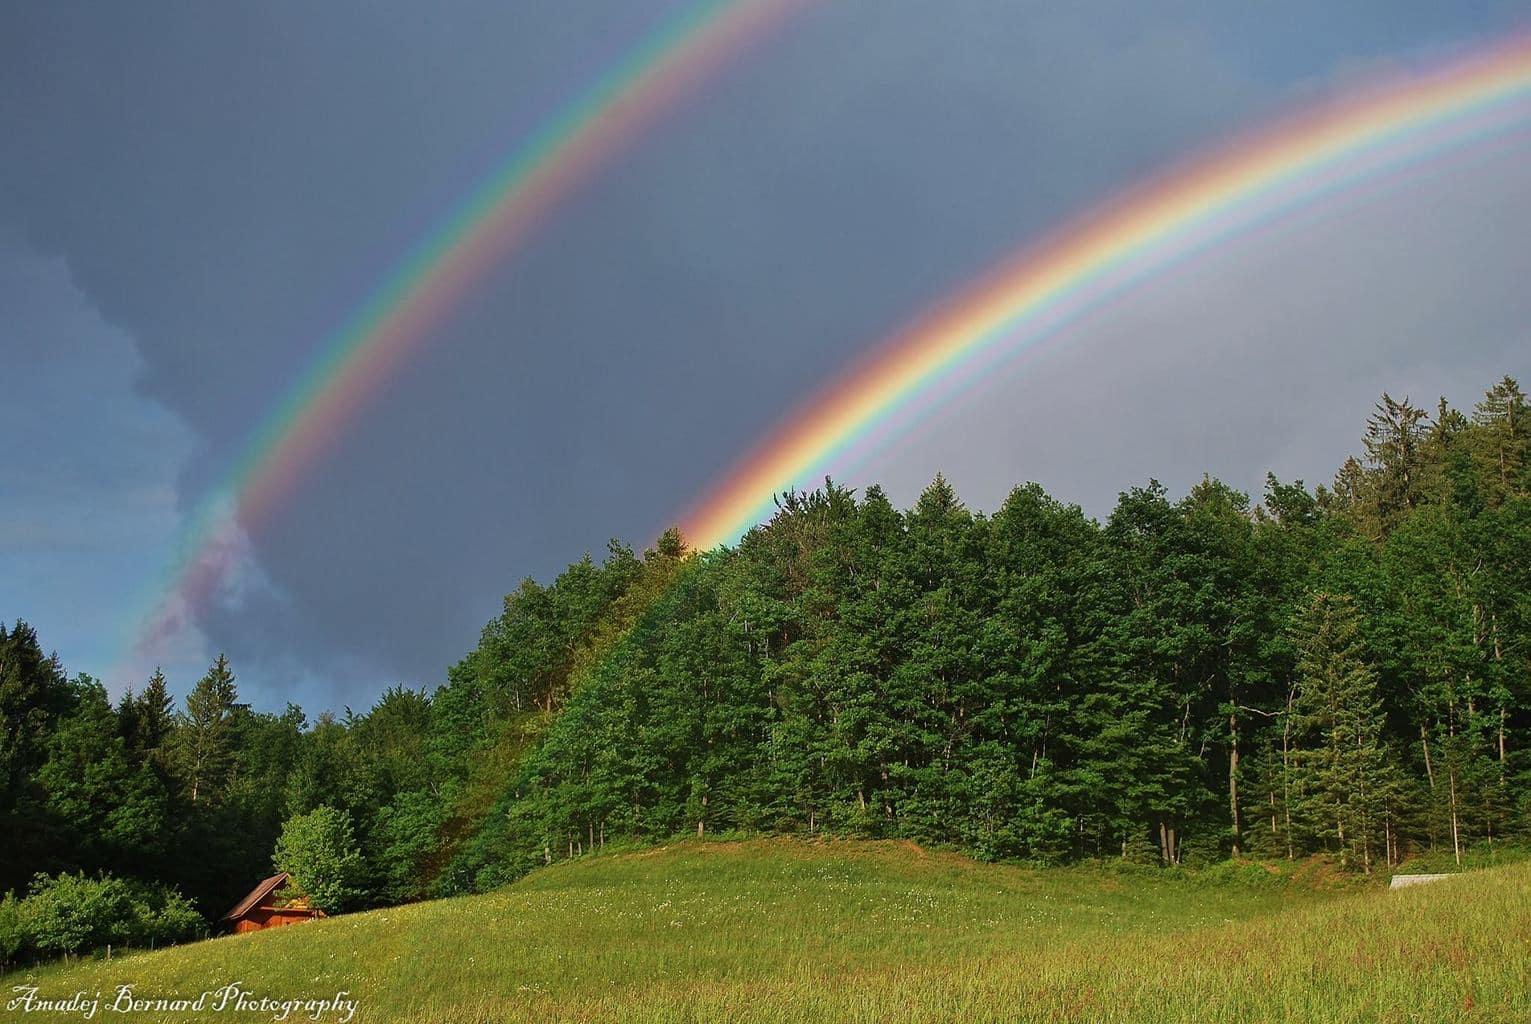 Amazing double Rainbow on Bukov Vrh (Slovenia) today